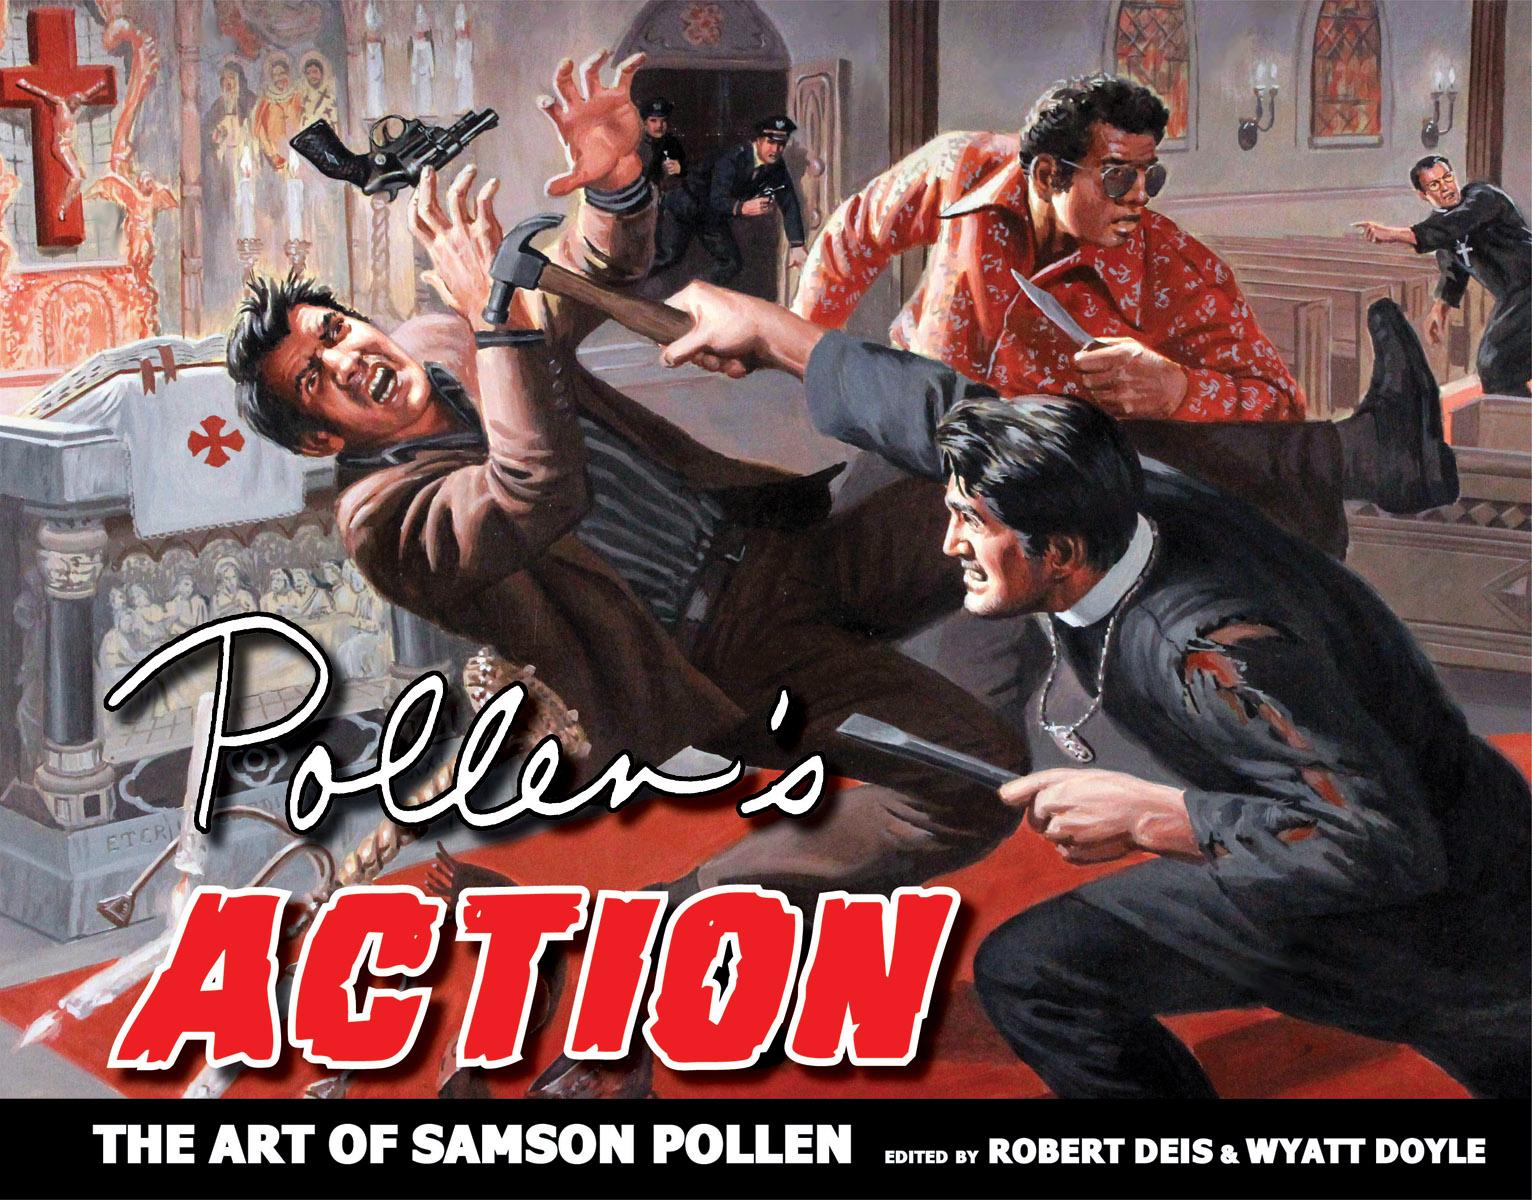 POLLEN'S ACTION / Samson Pollen